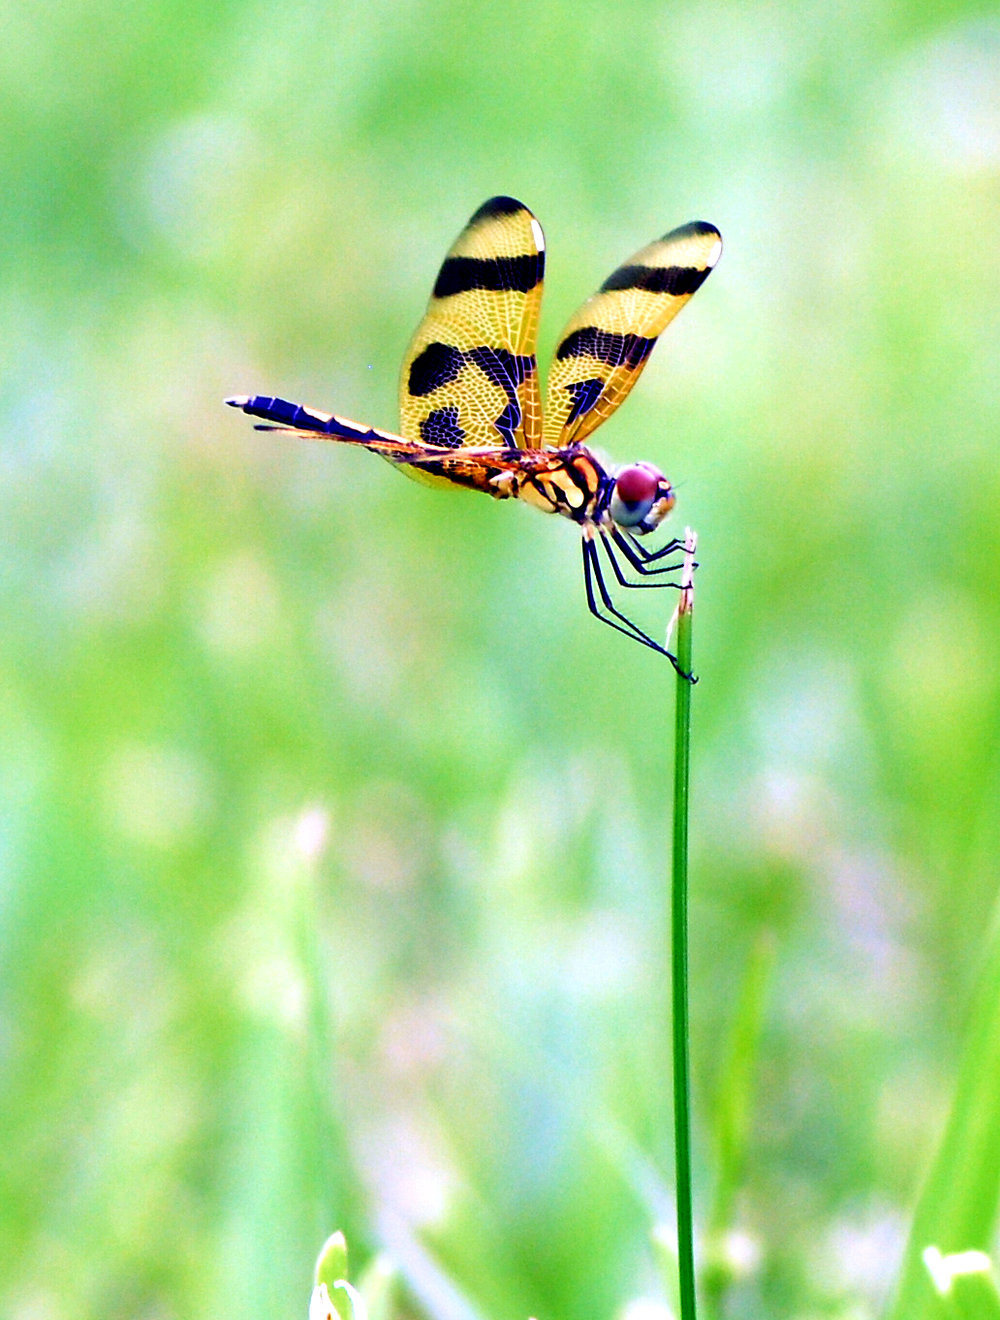 dragonfly6.jpg